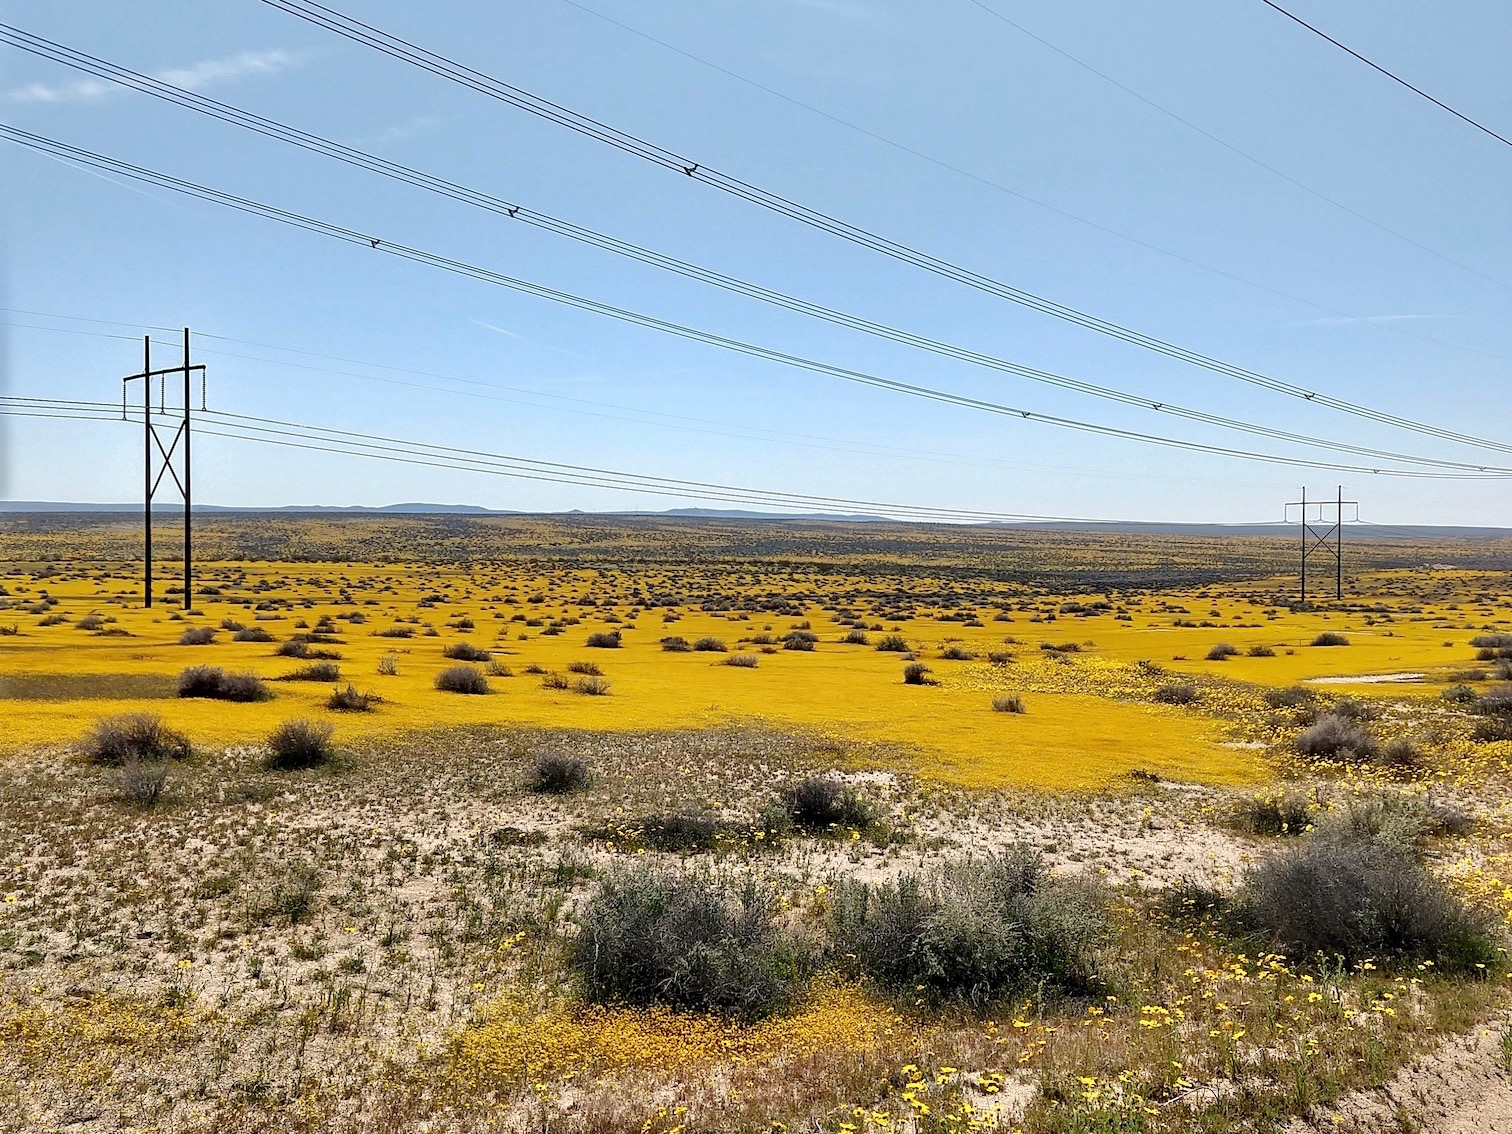 Mojave Desert blanketed in yellow flowers